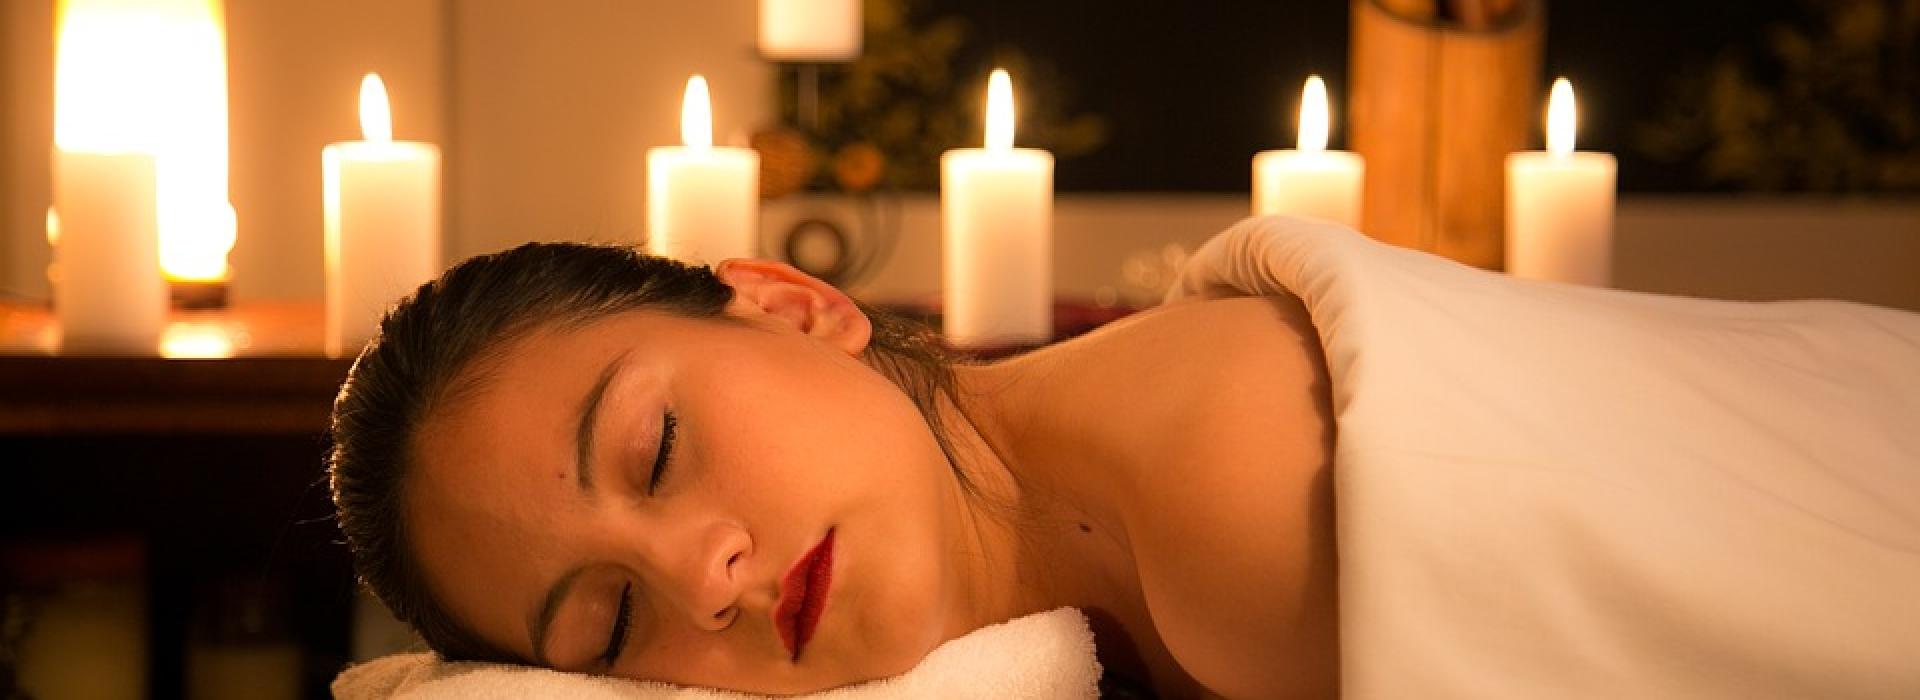 Massagepraktijk het Hogeland